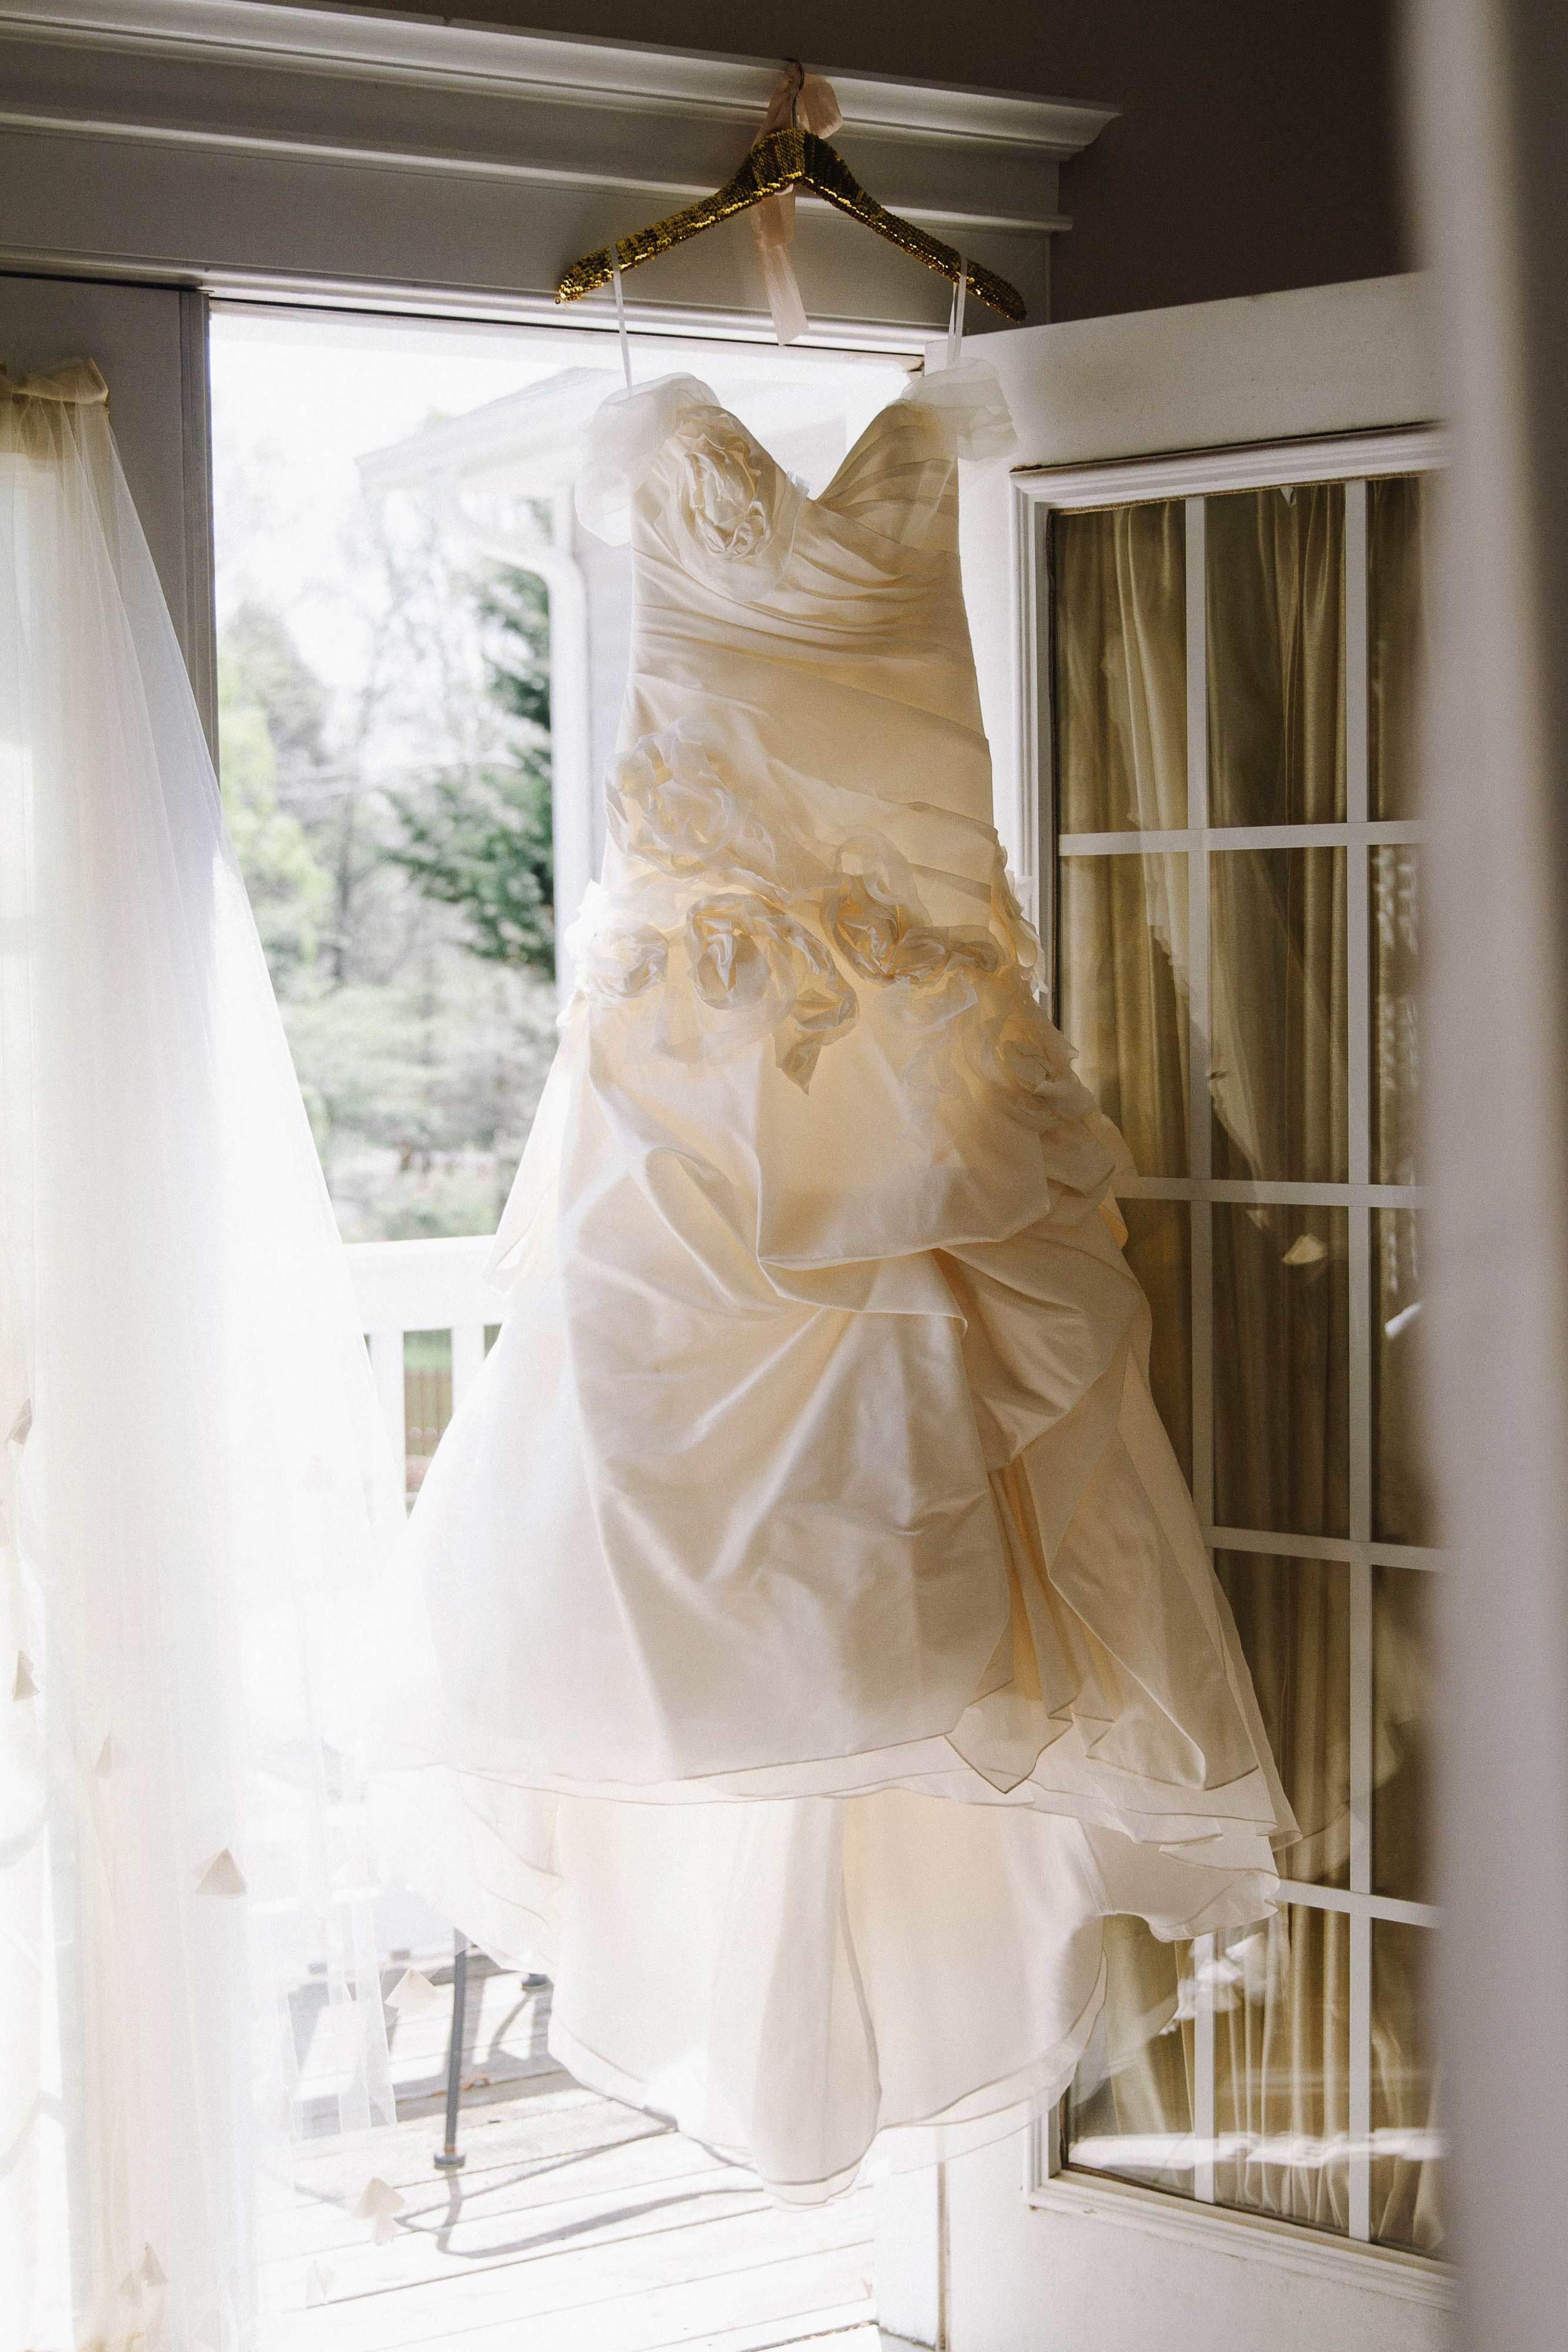 Radka-Wedding-Radka-April-18-2015-0027.jpg